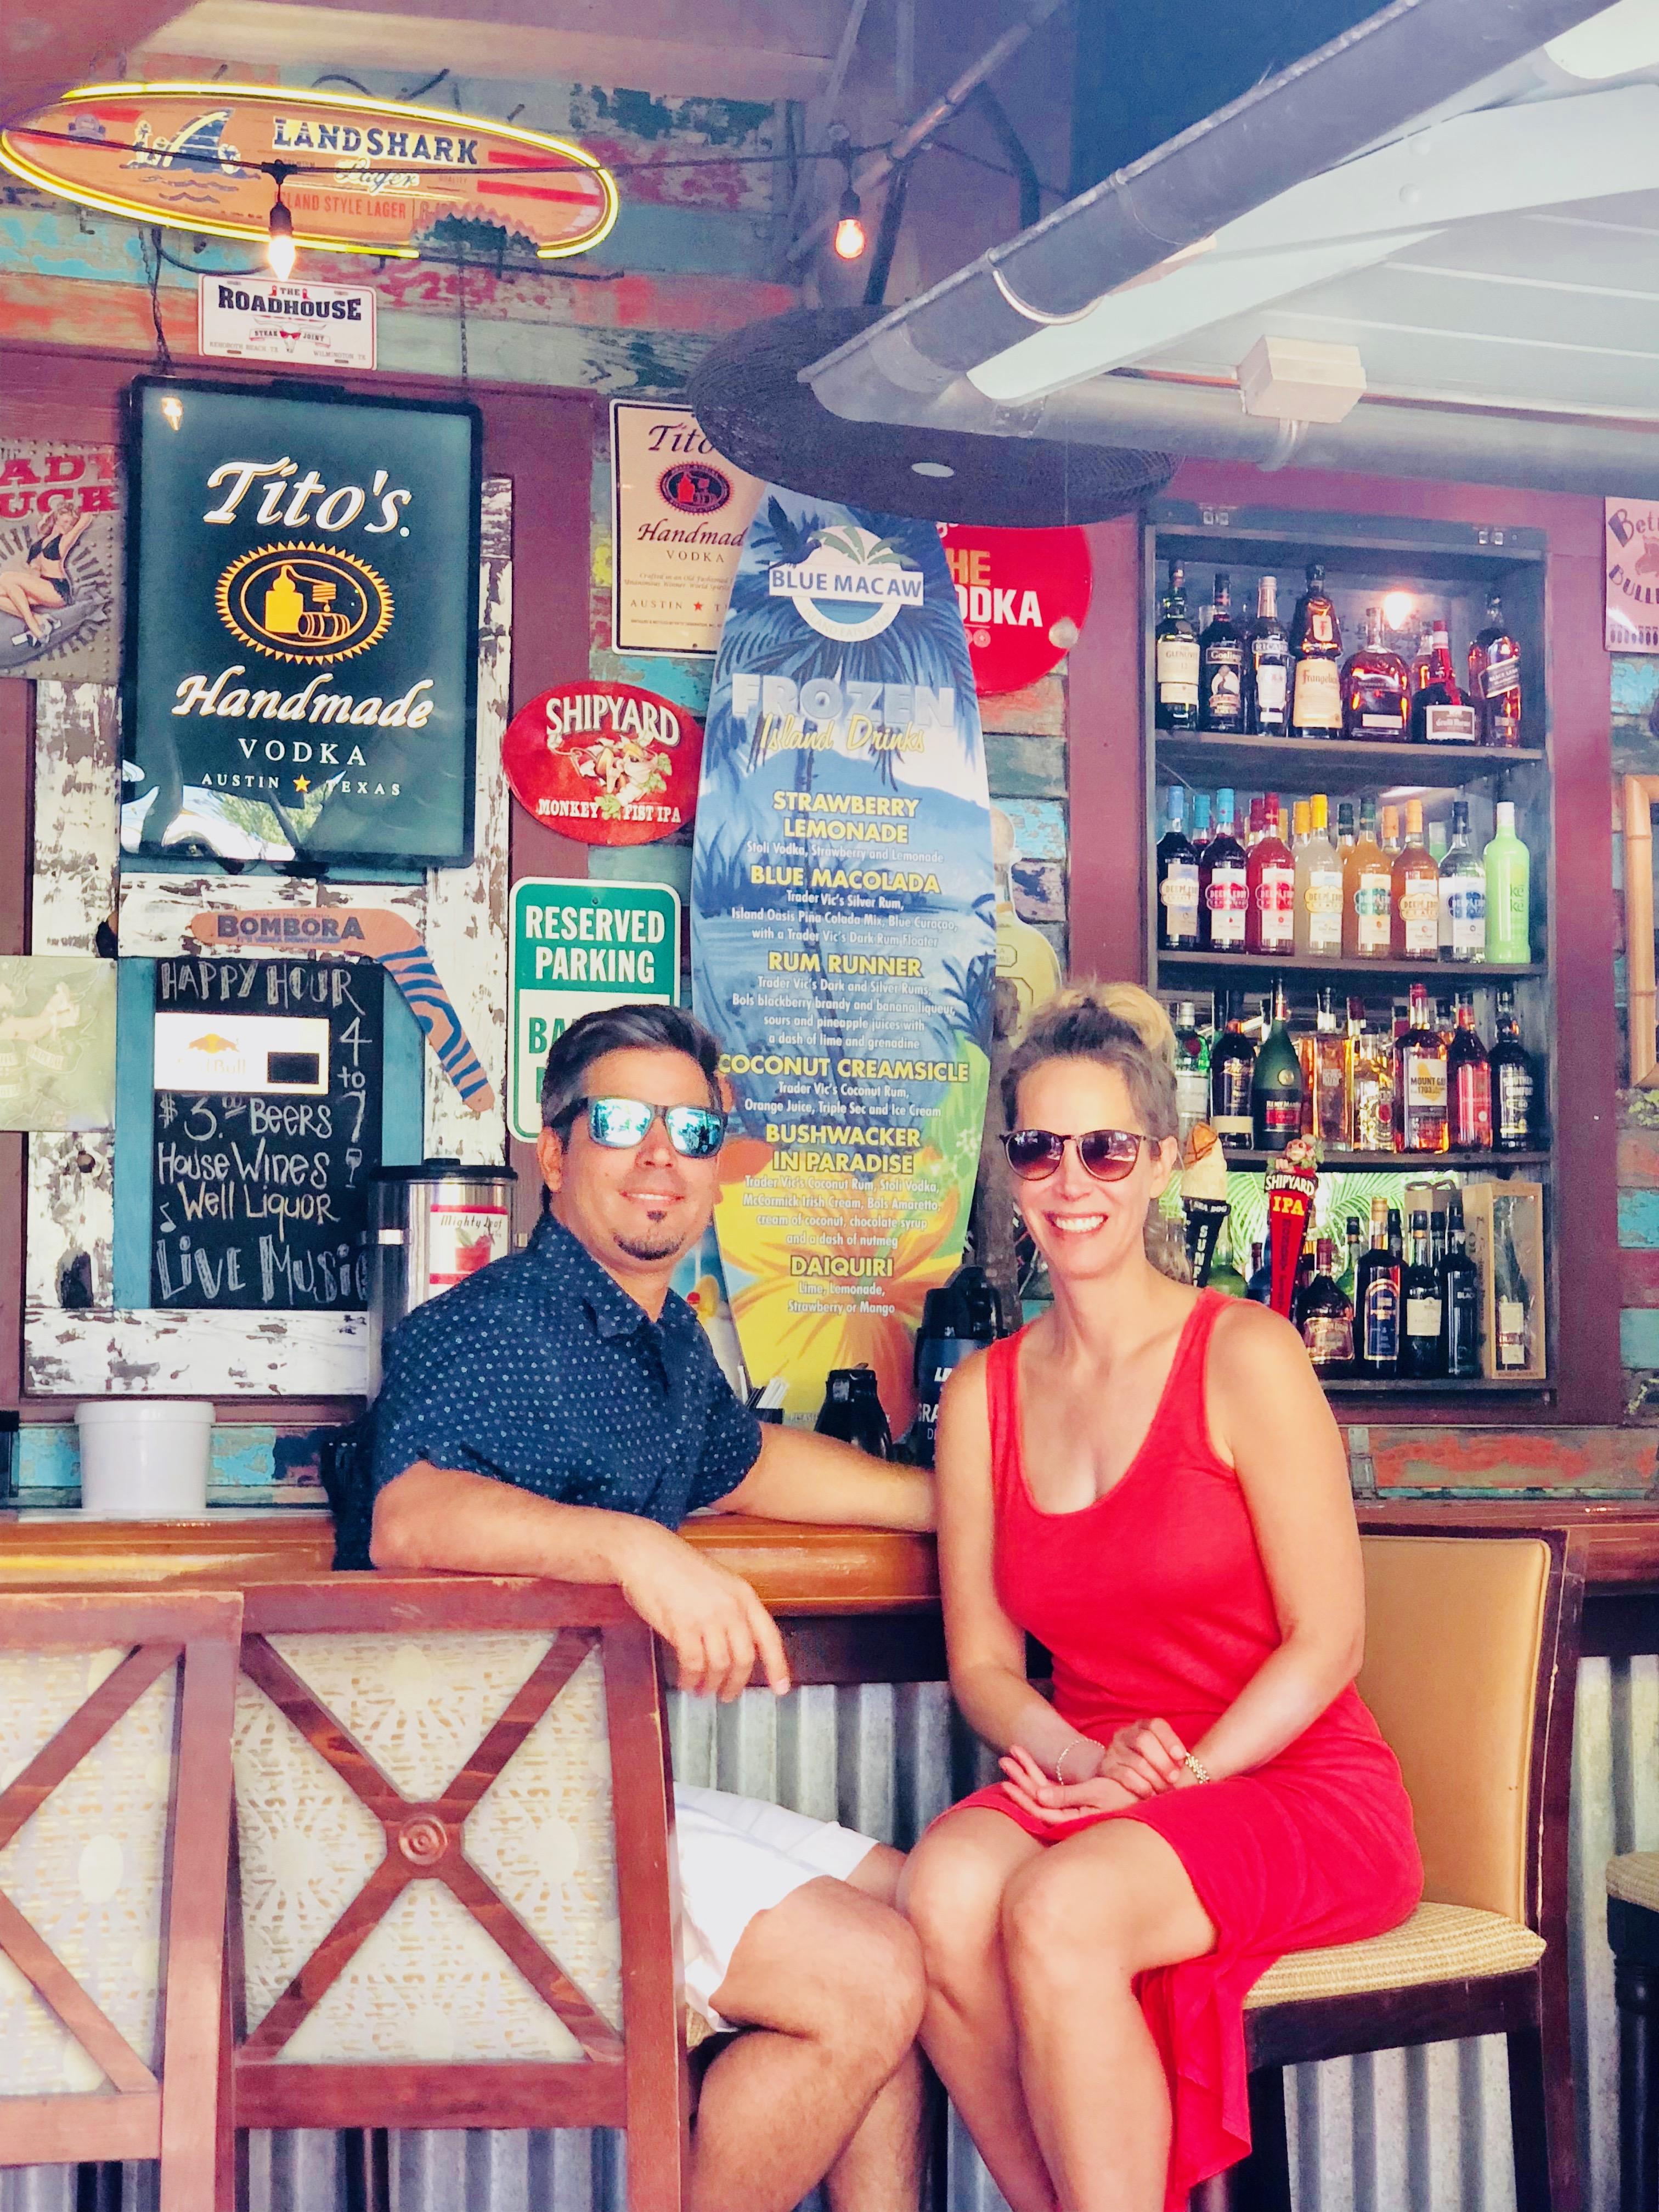 Celebrity interior designer Lori Dennis and SoCal Contrator's Roy Yerushlami enjoying Bloody Mary's in Key West